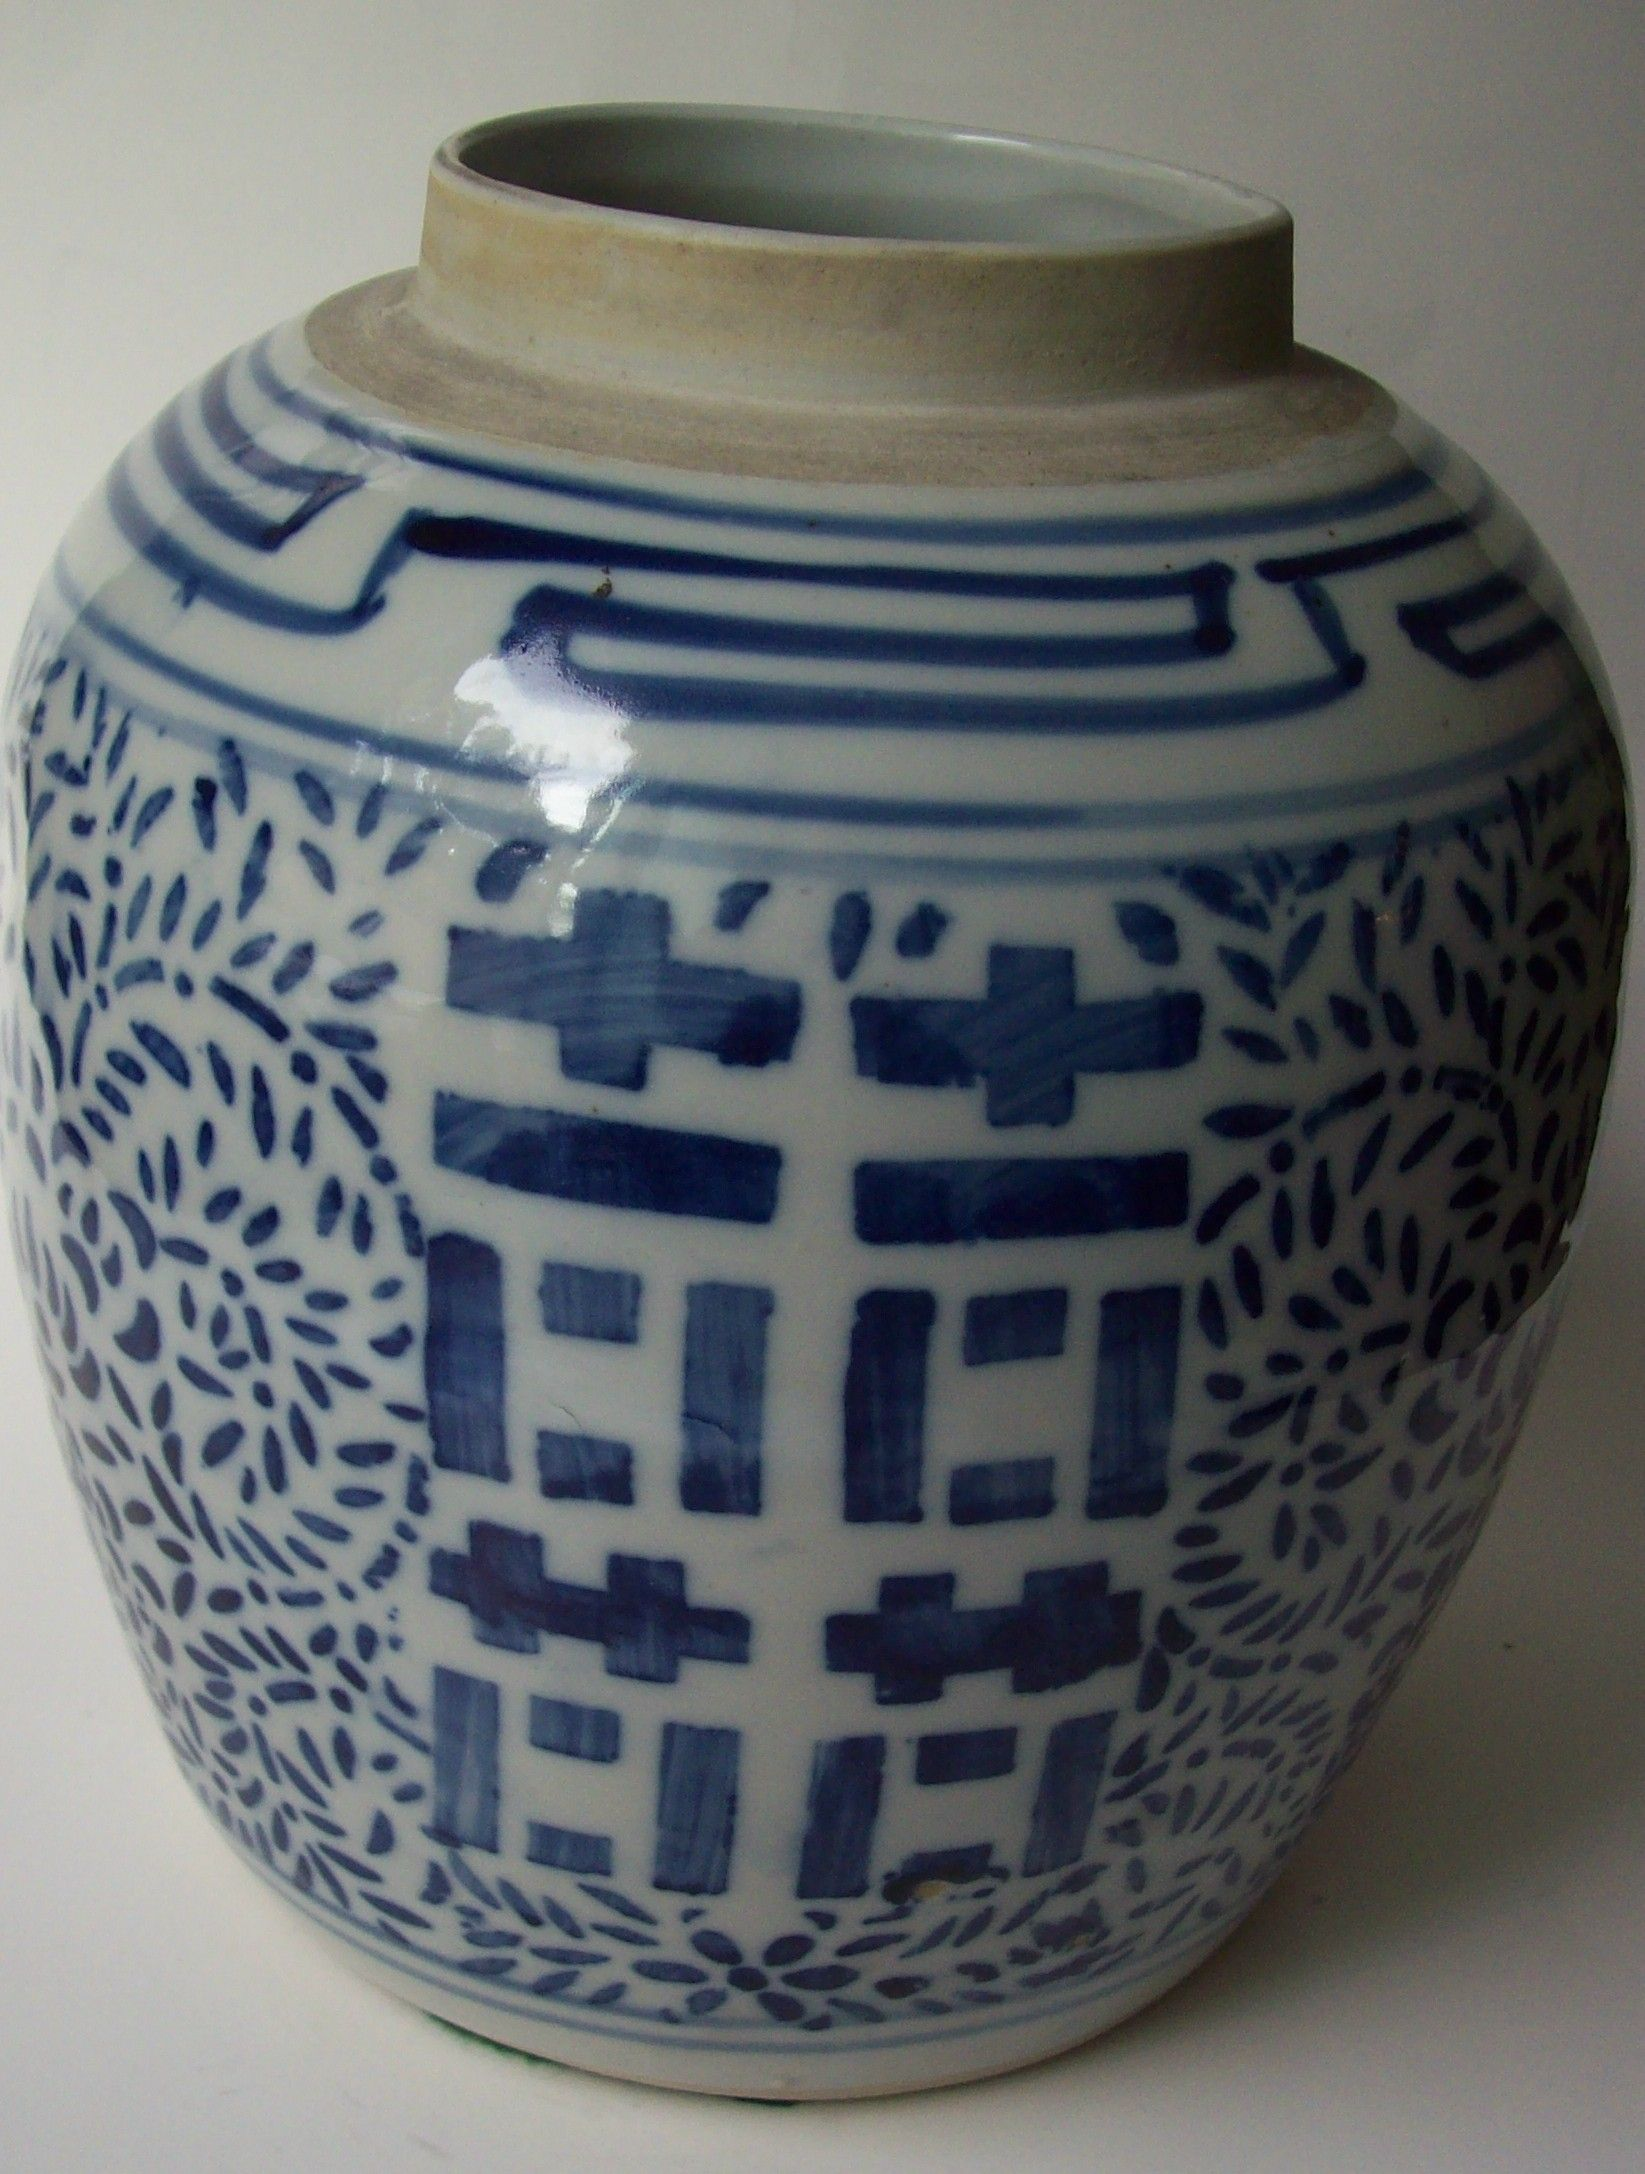 Chien lung qianlong famille rose medallion vase mark vintage vases antique chinese blue white porcelain hand painted ginger jar i ching symbol floridaeventfo Choice Image